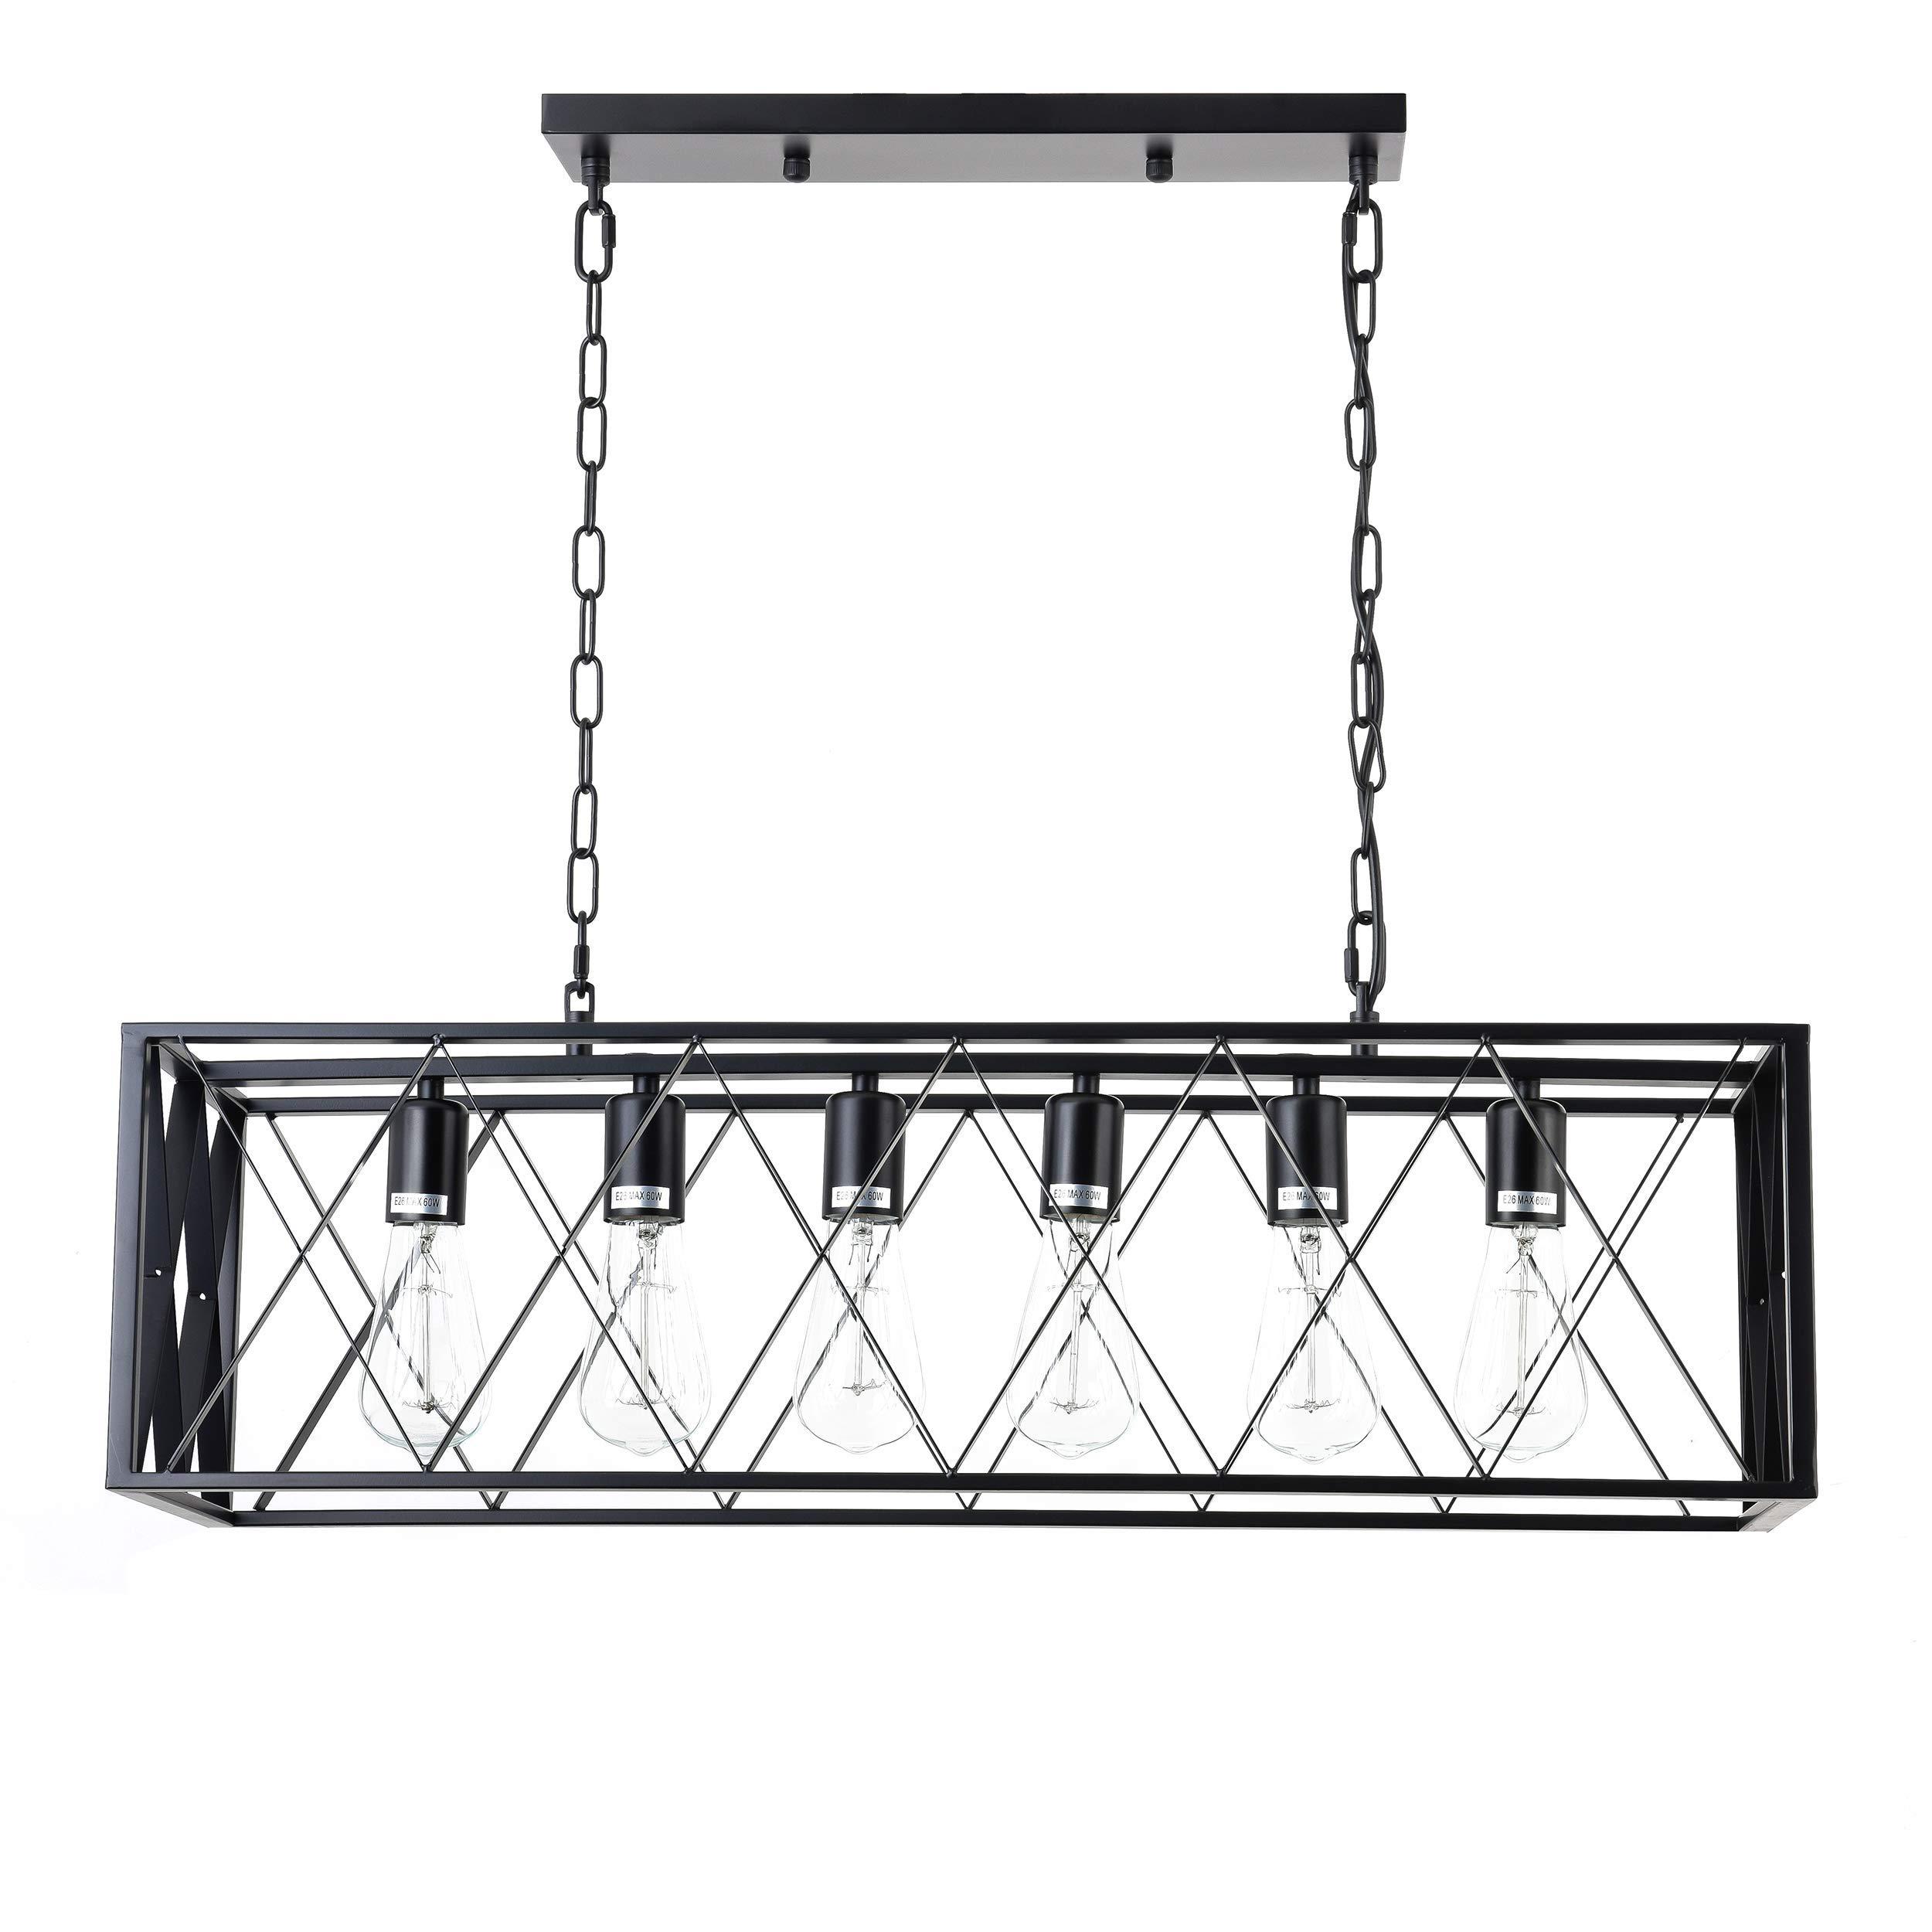 ISRAMP Kitchen Island Lighting Fixtures, 6-Light Rectangle Iron Matte Black Lamp Shade Industrial Pendant Light Rustic Farmhouse Chandelier